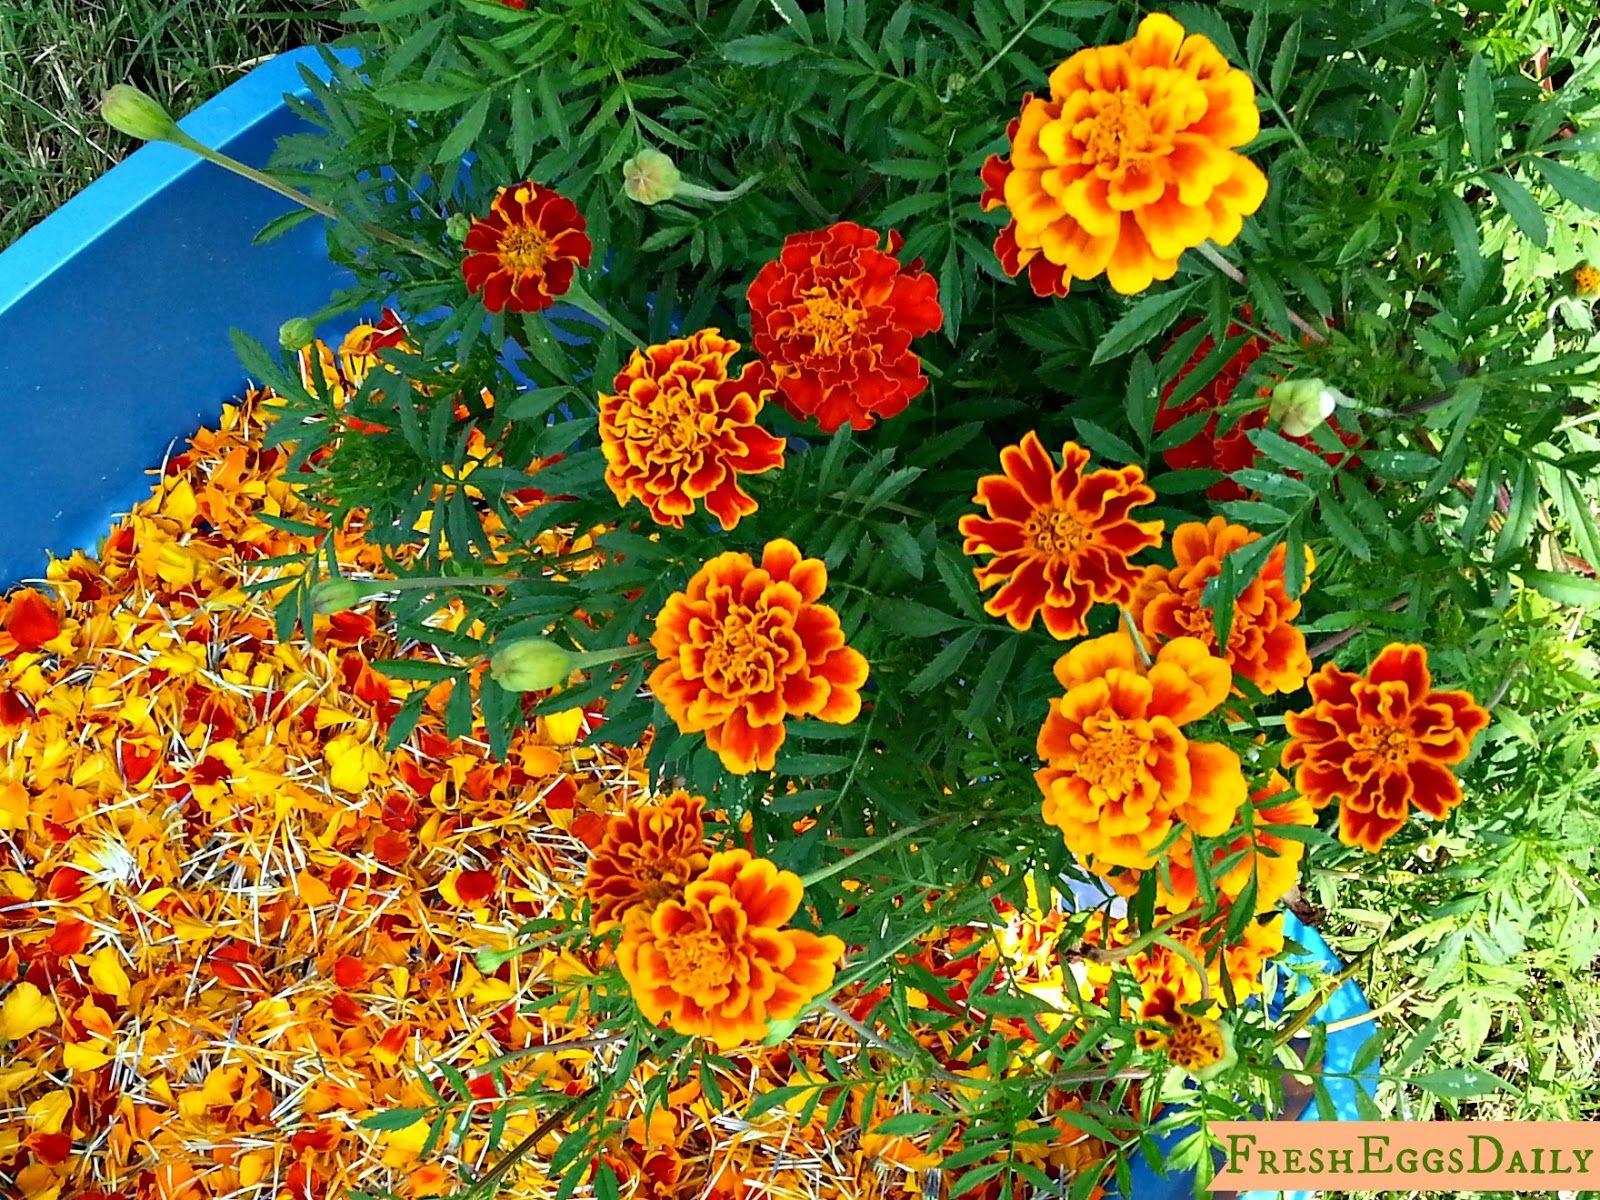 fresh eggs daily marigolds for orange egg yolks and healthy